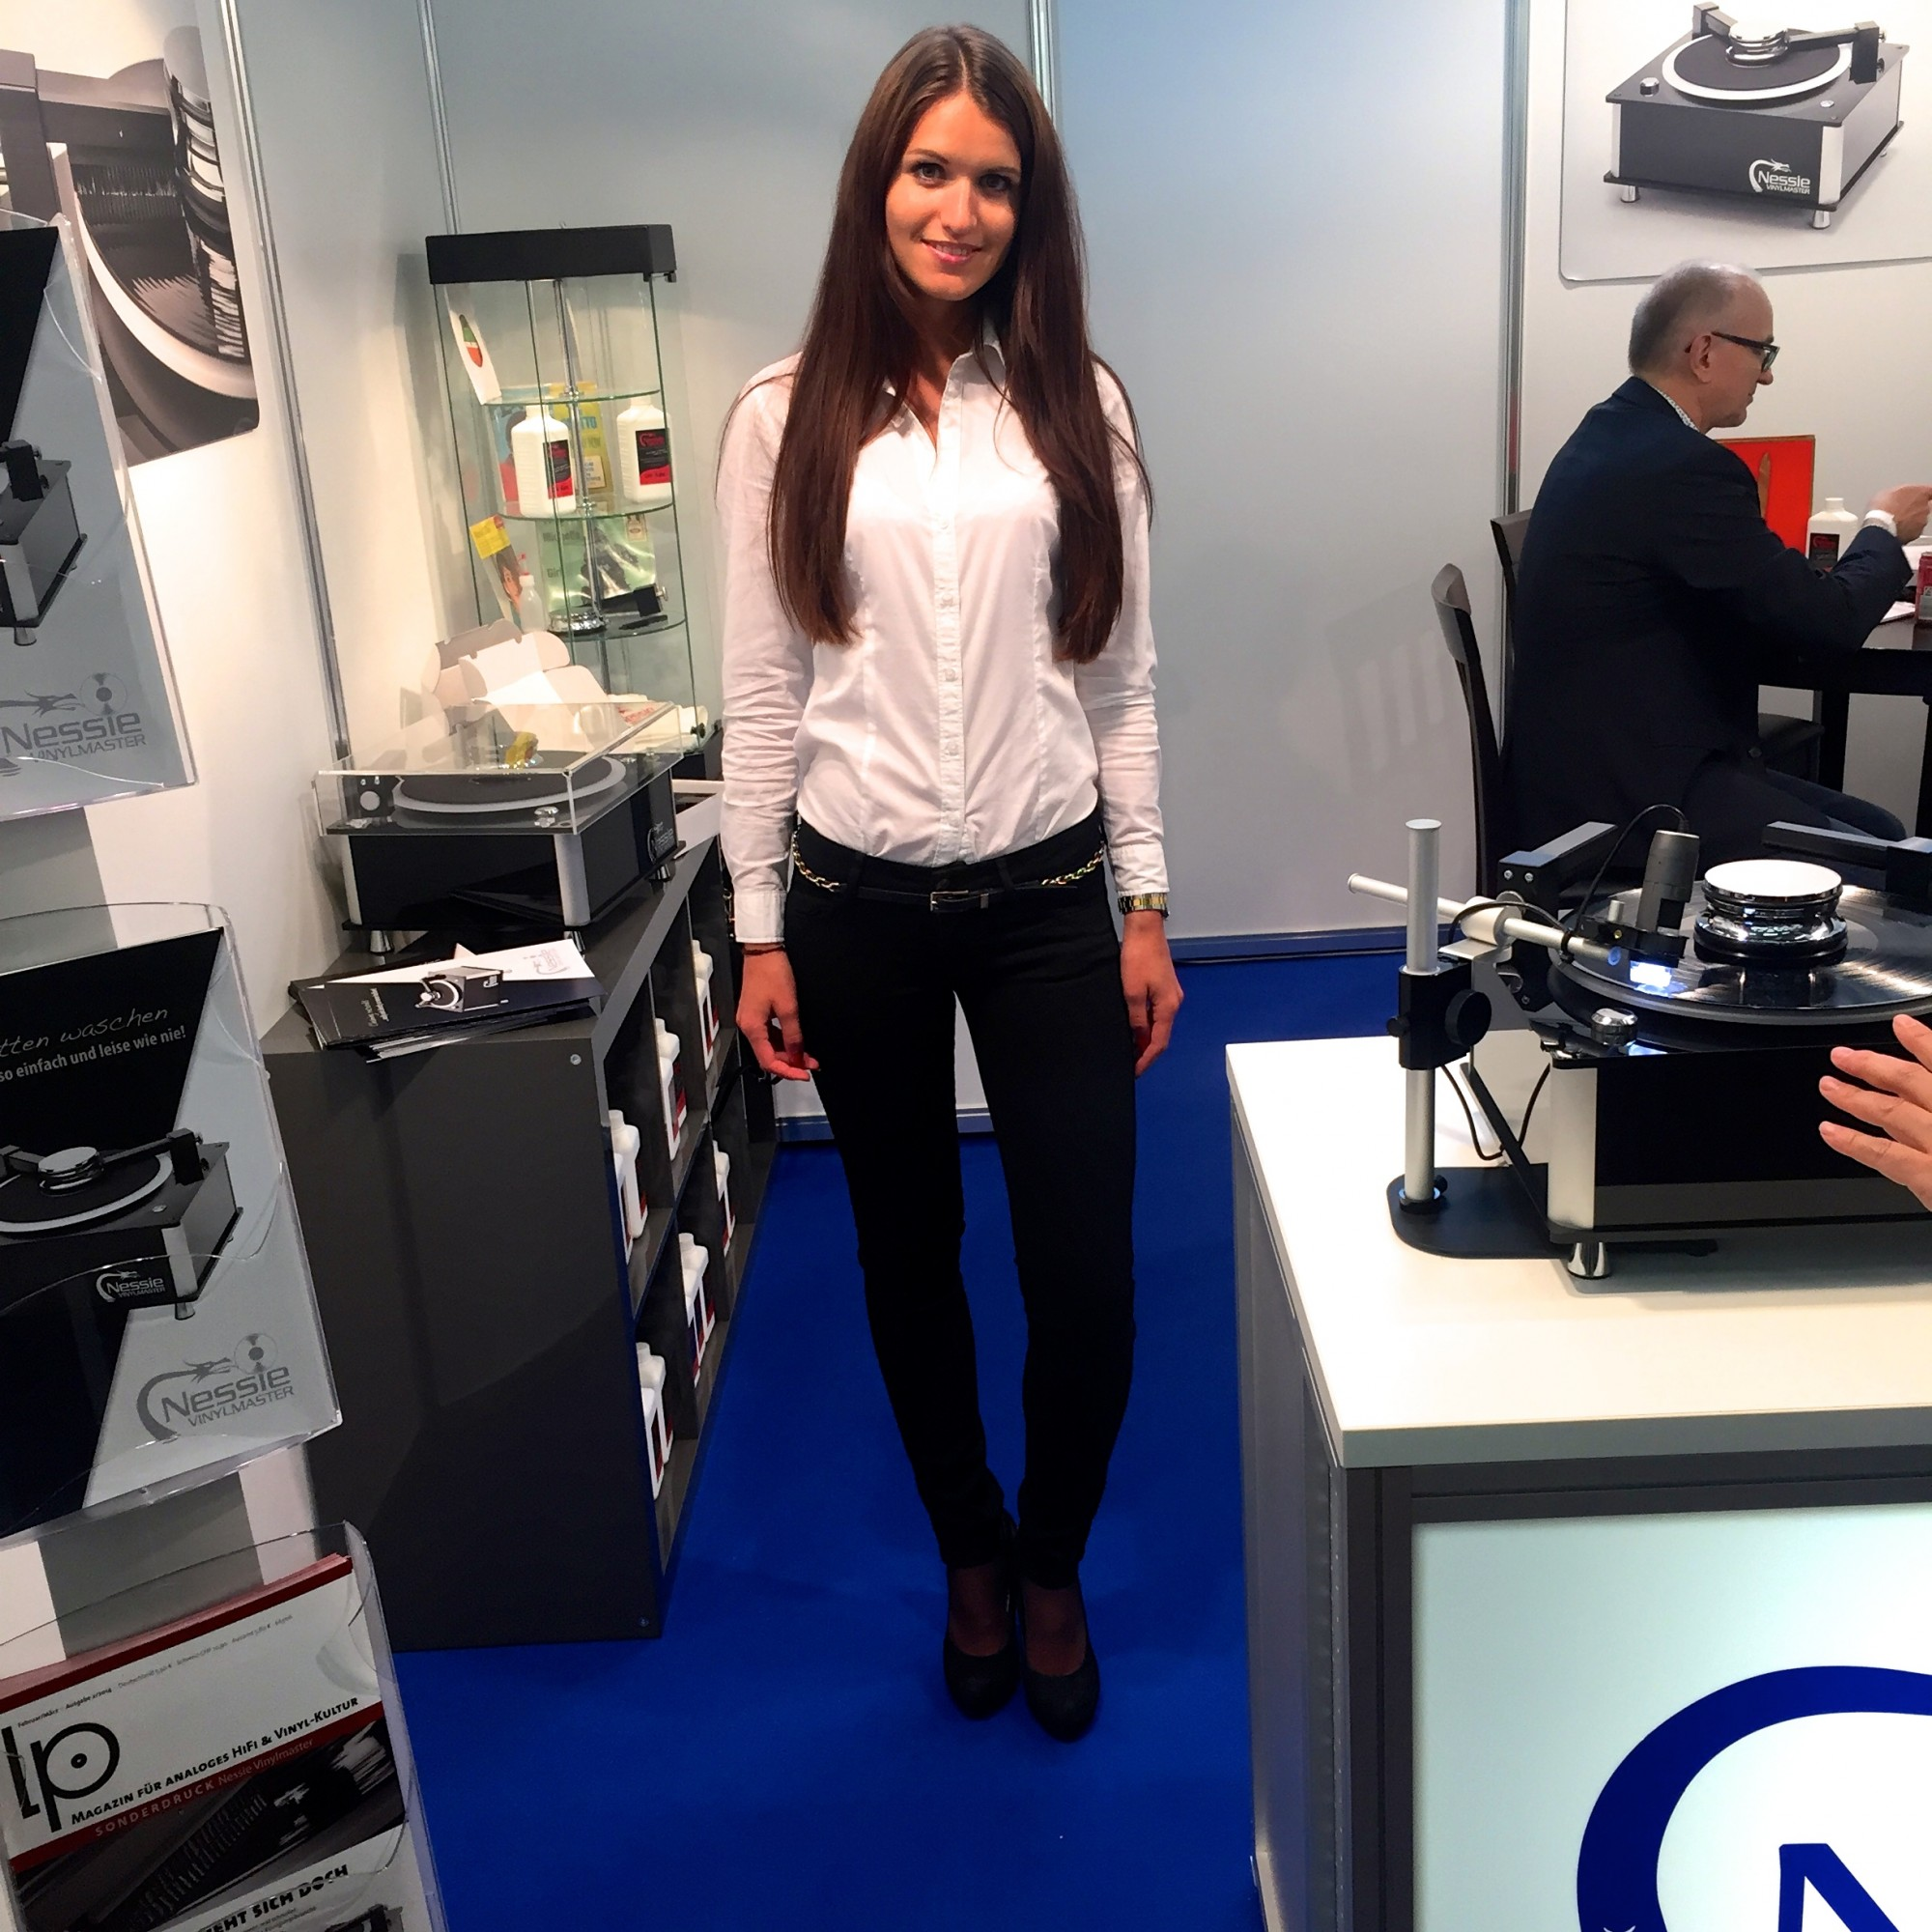 maria hostess model in m nchen ingolstadt instaff. Black Bedroom Furniture Sets. Home Design Ideas